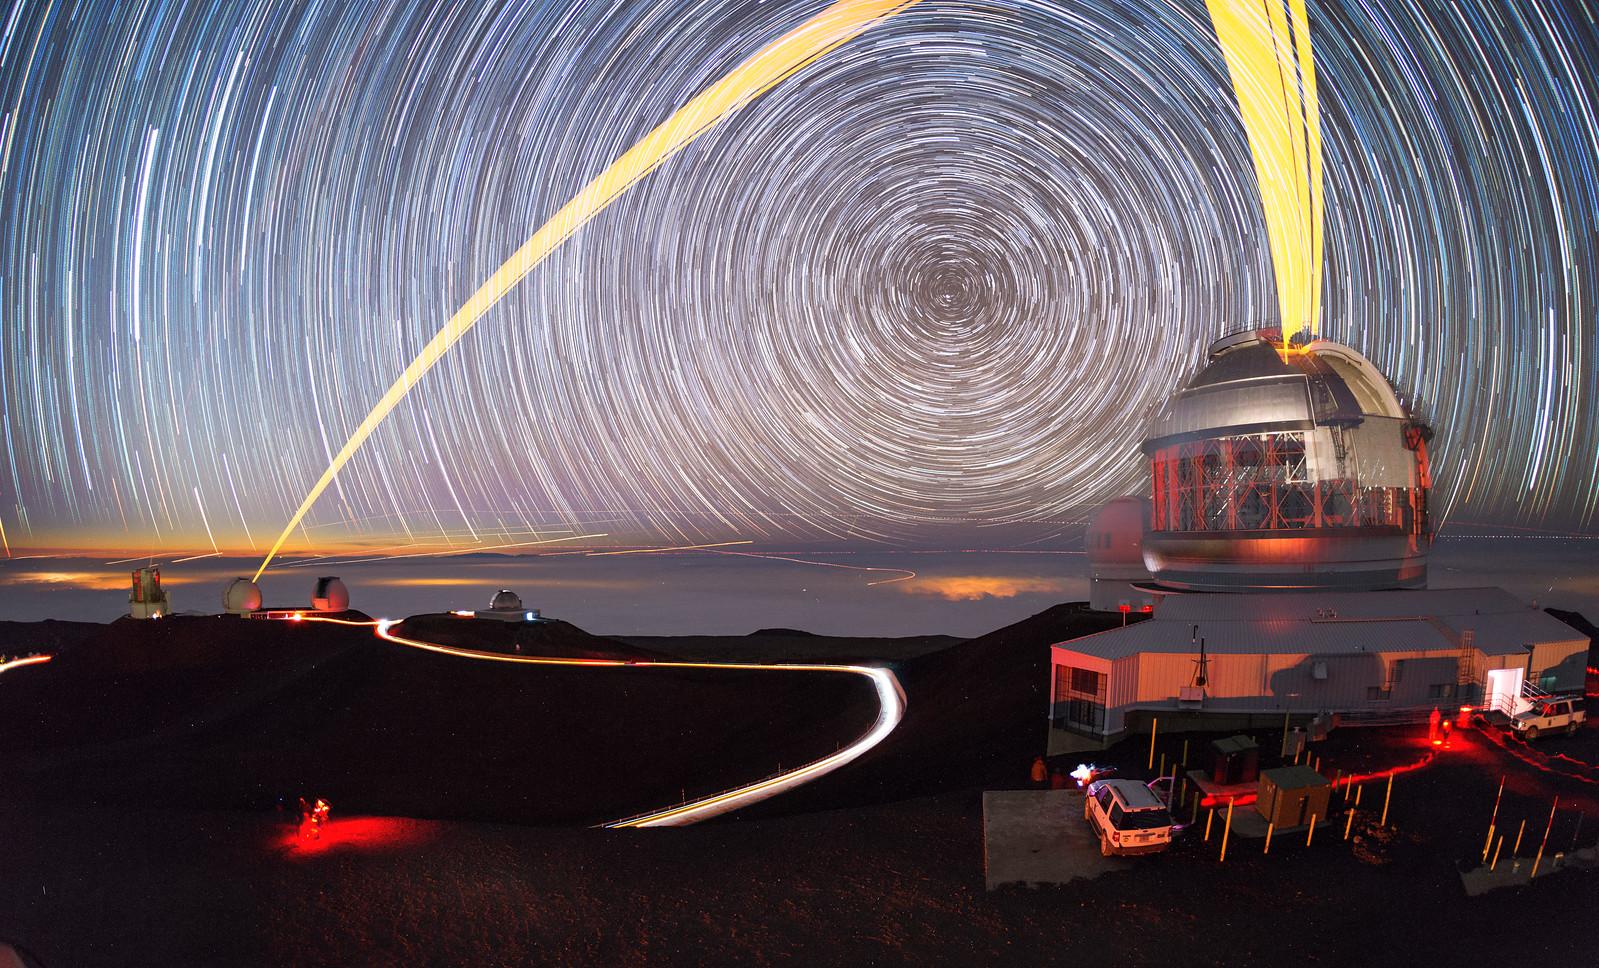 Mauna Kea Telescopes beneath the Swirling Skies